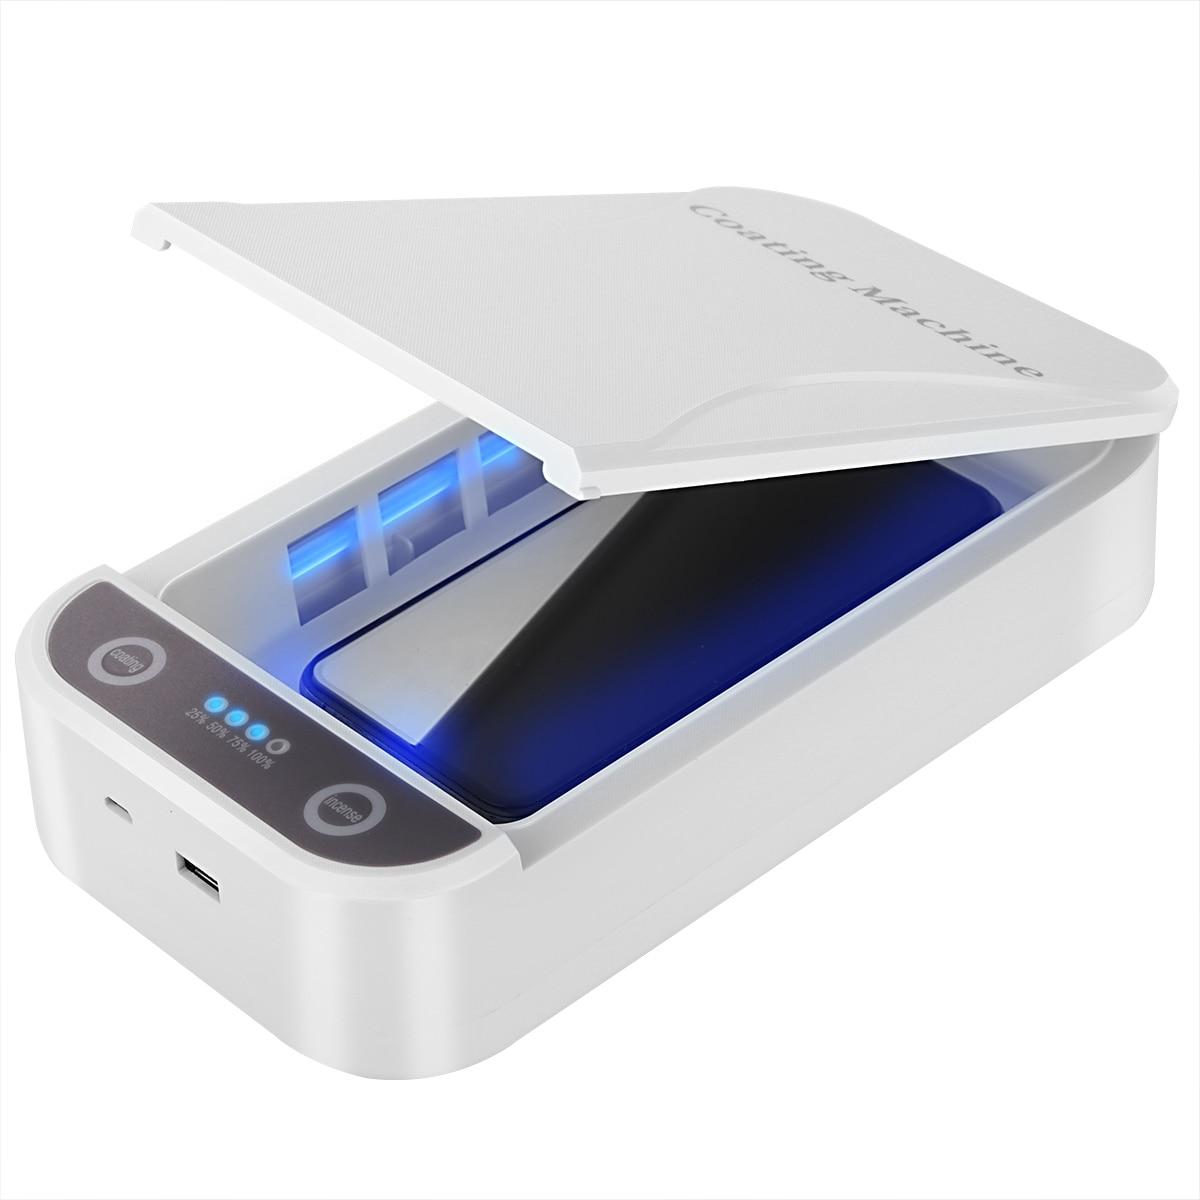 UV Sterilizer Box Portable Sterilizer Case UV Sterilizer Cell Phone Disinfection Boxes With USB Cable Dual UV Lights